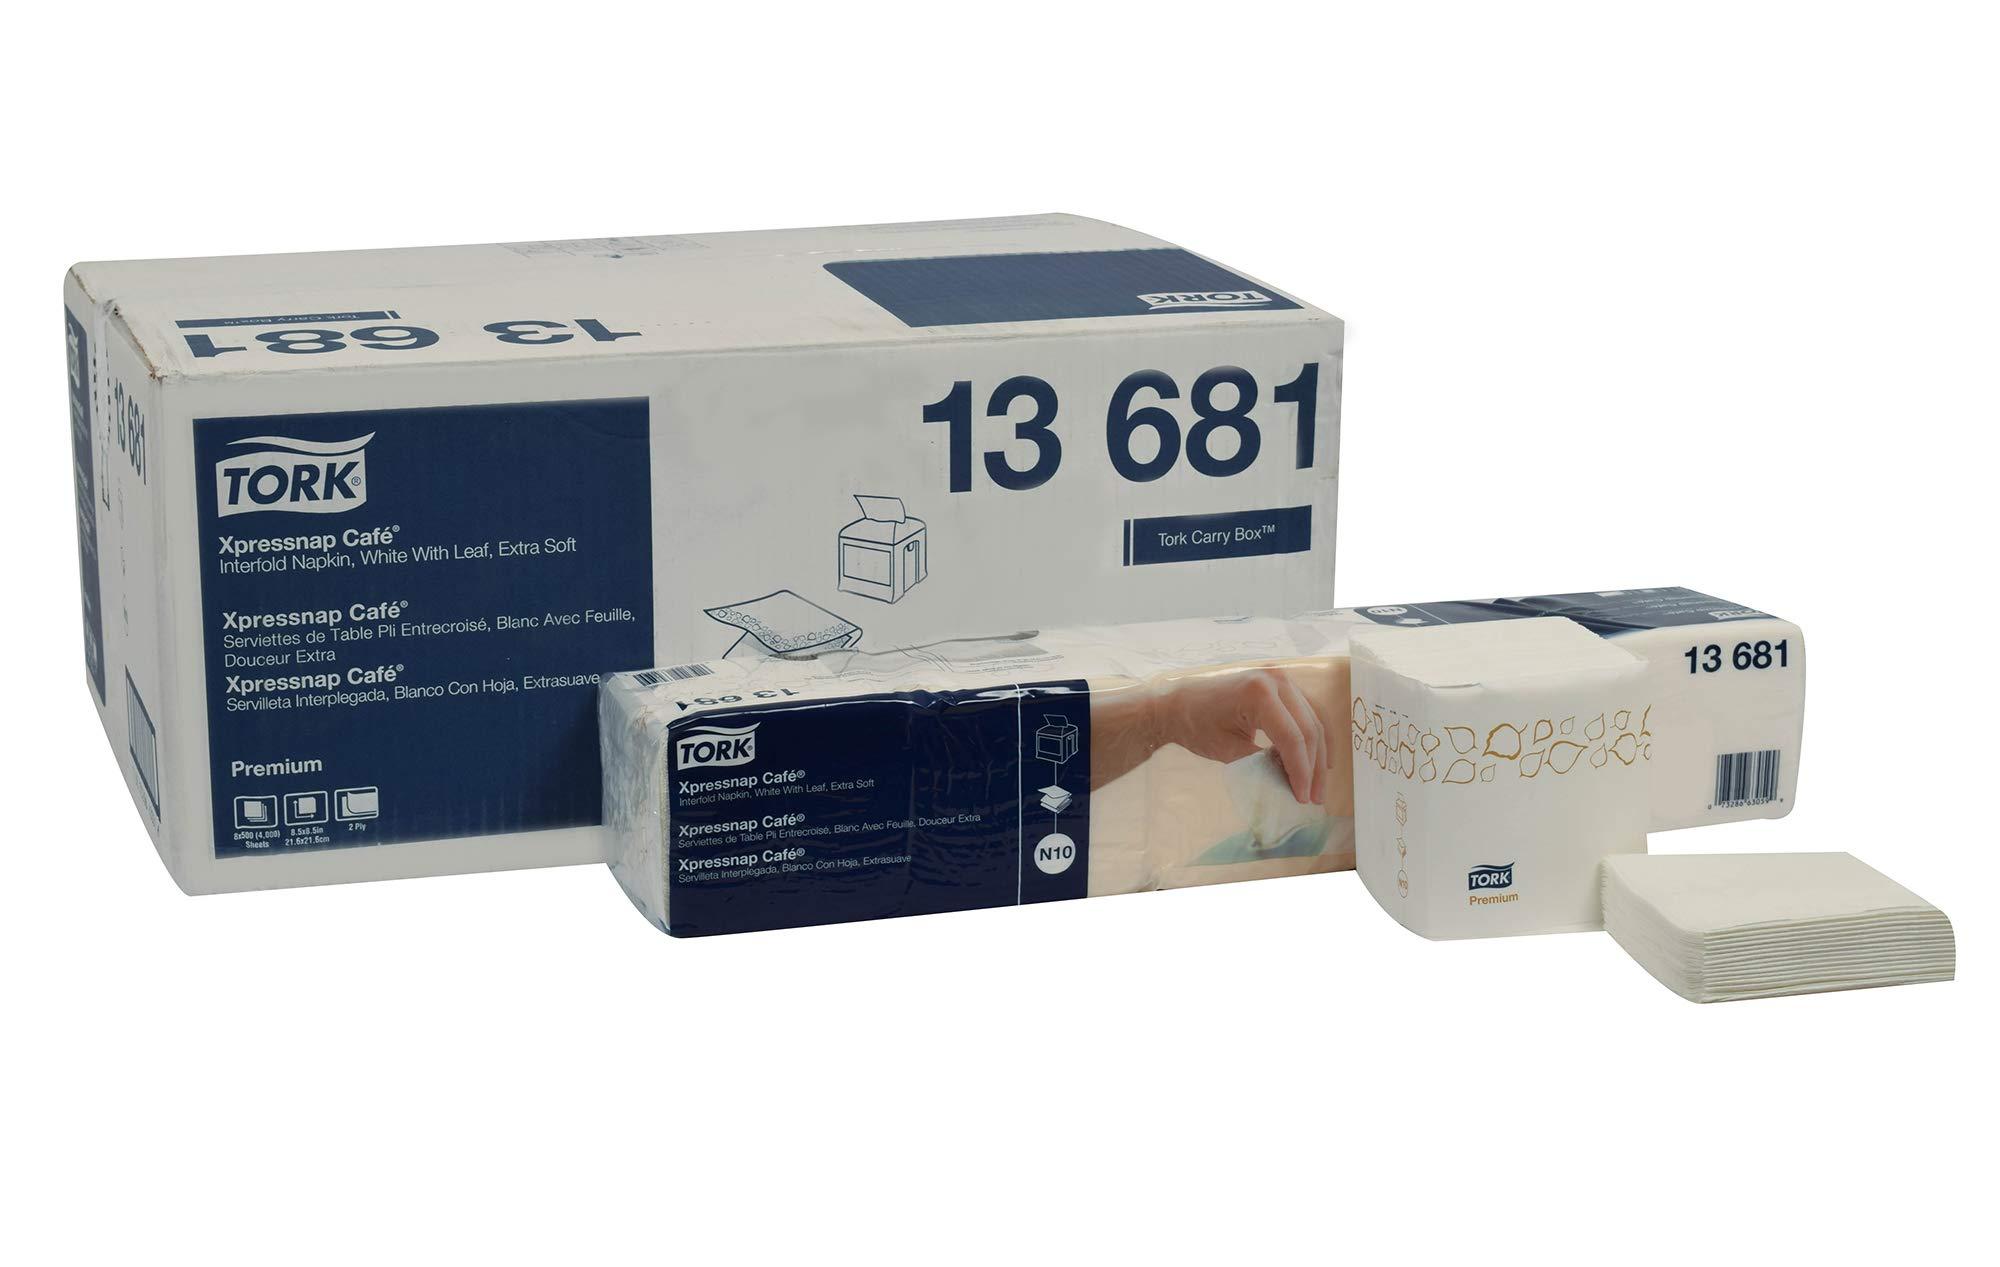 Tork 13681 Premium Extra Soft Xpressnap Café Dispenser Napkin, Interfold, 2-Ply, 8.5'' Length x 8.5'' Width, White, (Case of 8 Poly Packs, 500 per Pack, 4,000 Napkins)